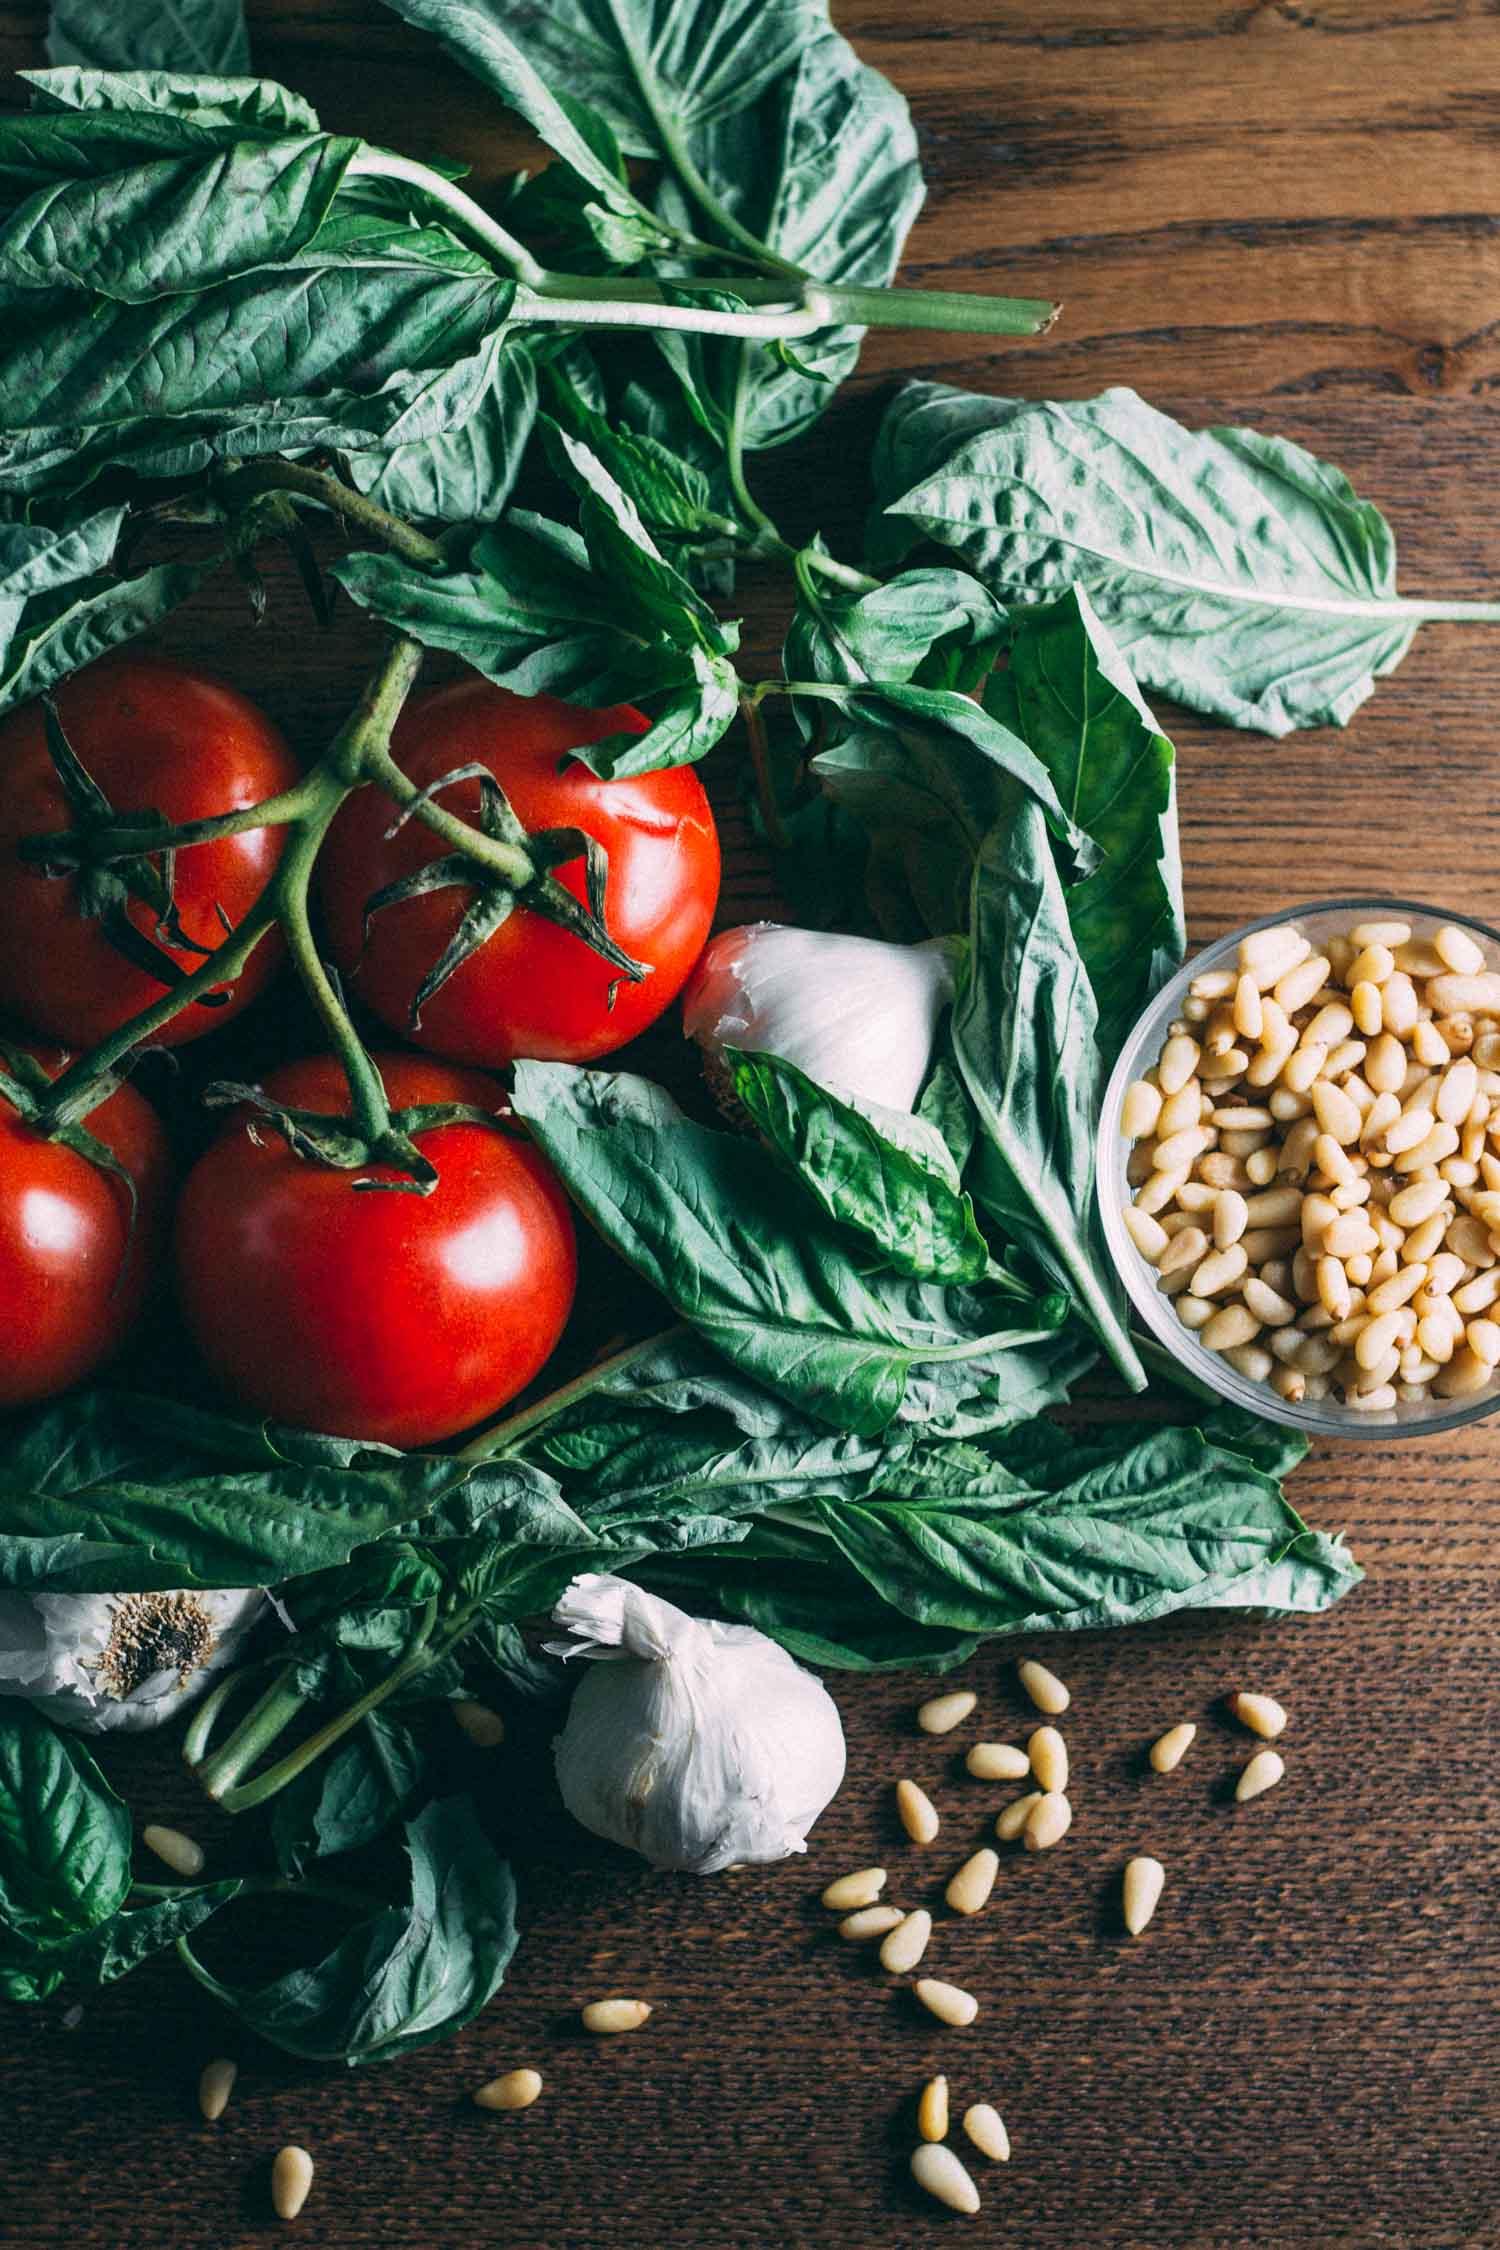 Sun-Dried Tomato Best-o Pesto Pasta #basil #garlic #tomatoes #sauce